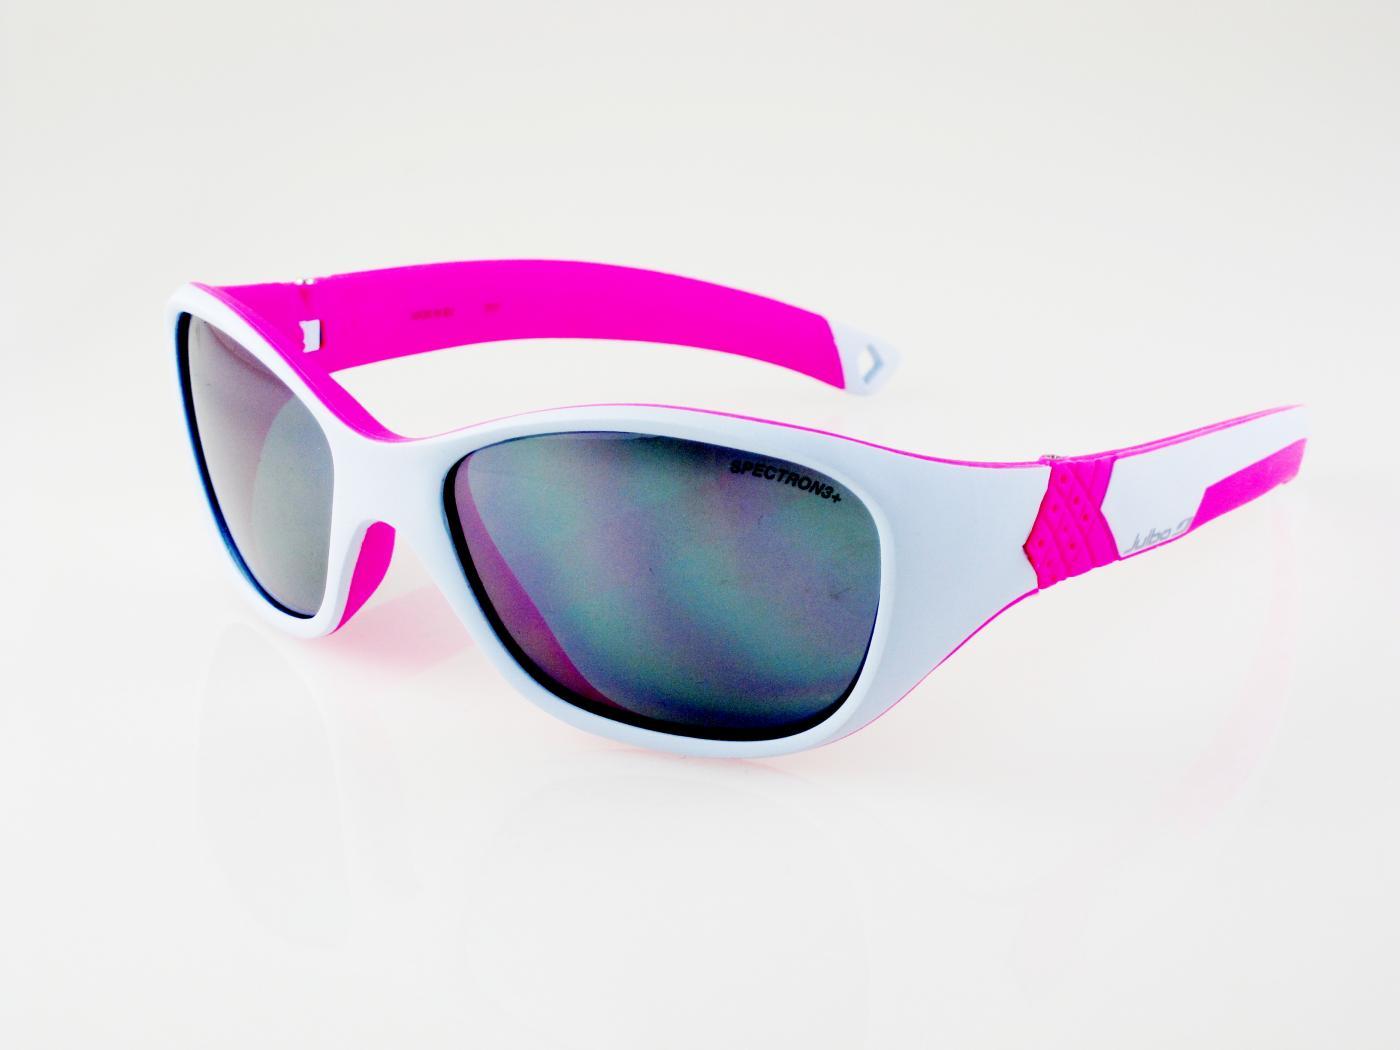 Detské slnečné okuliare Julbo a5790417038